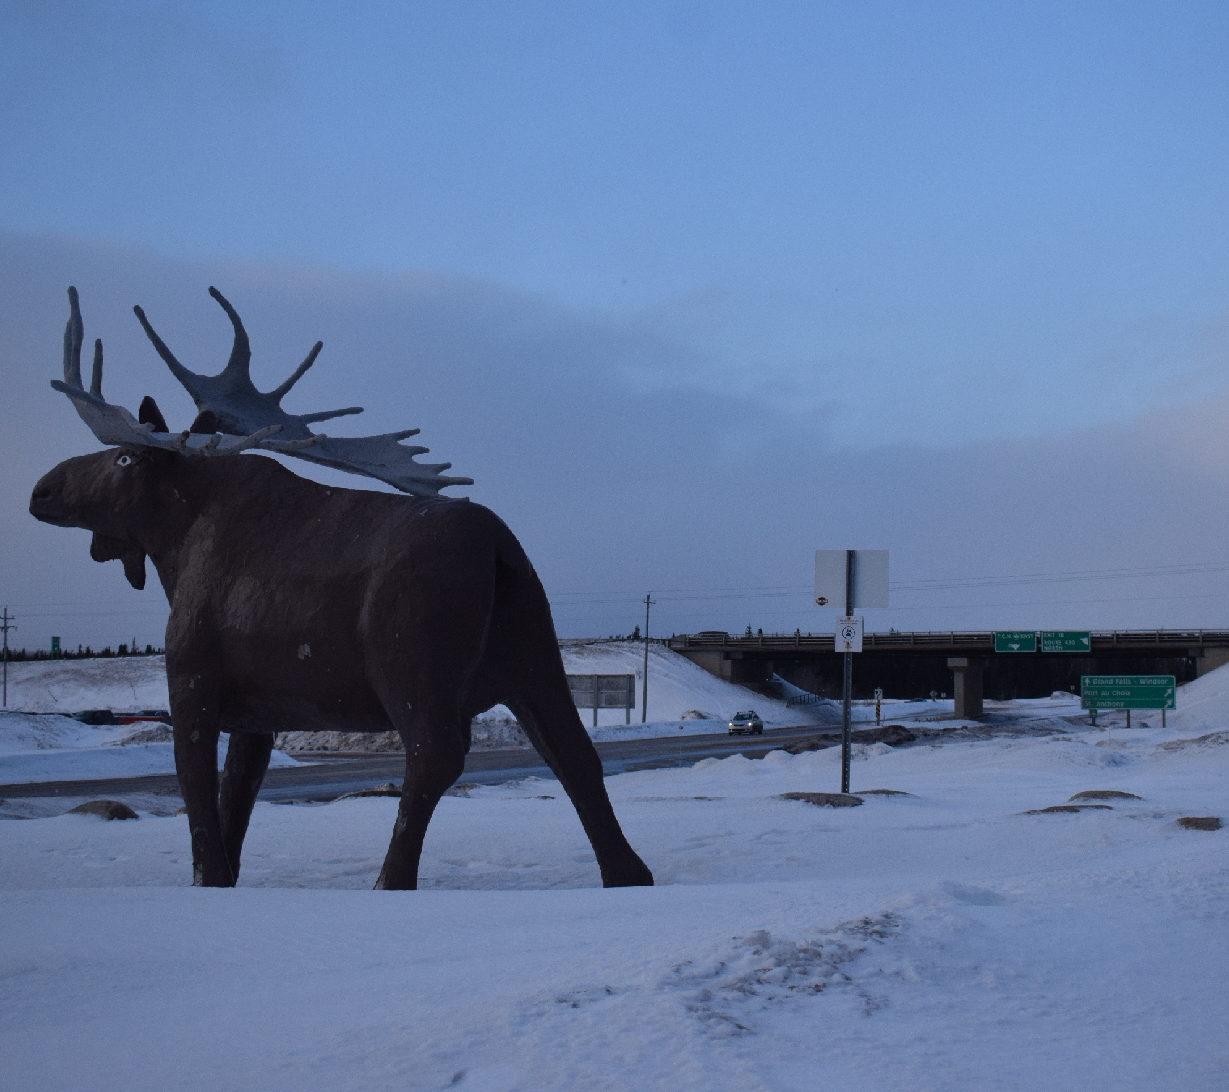 moose statue stands along Deer Lake highway